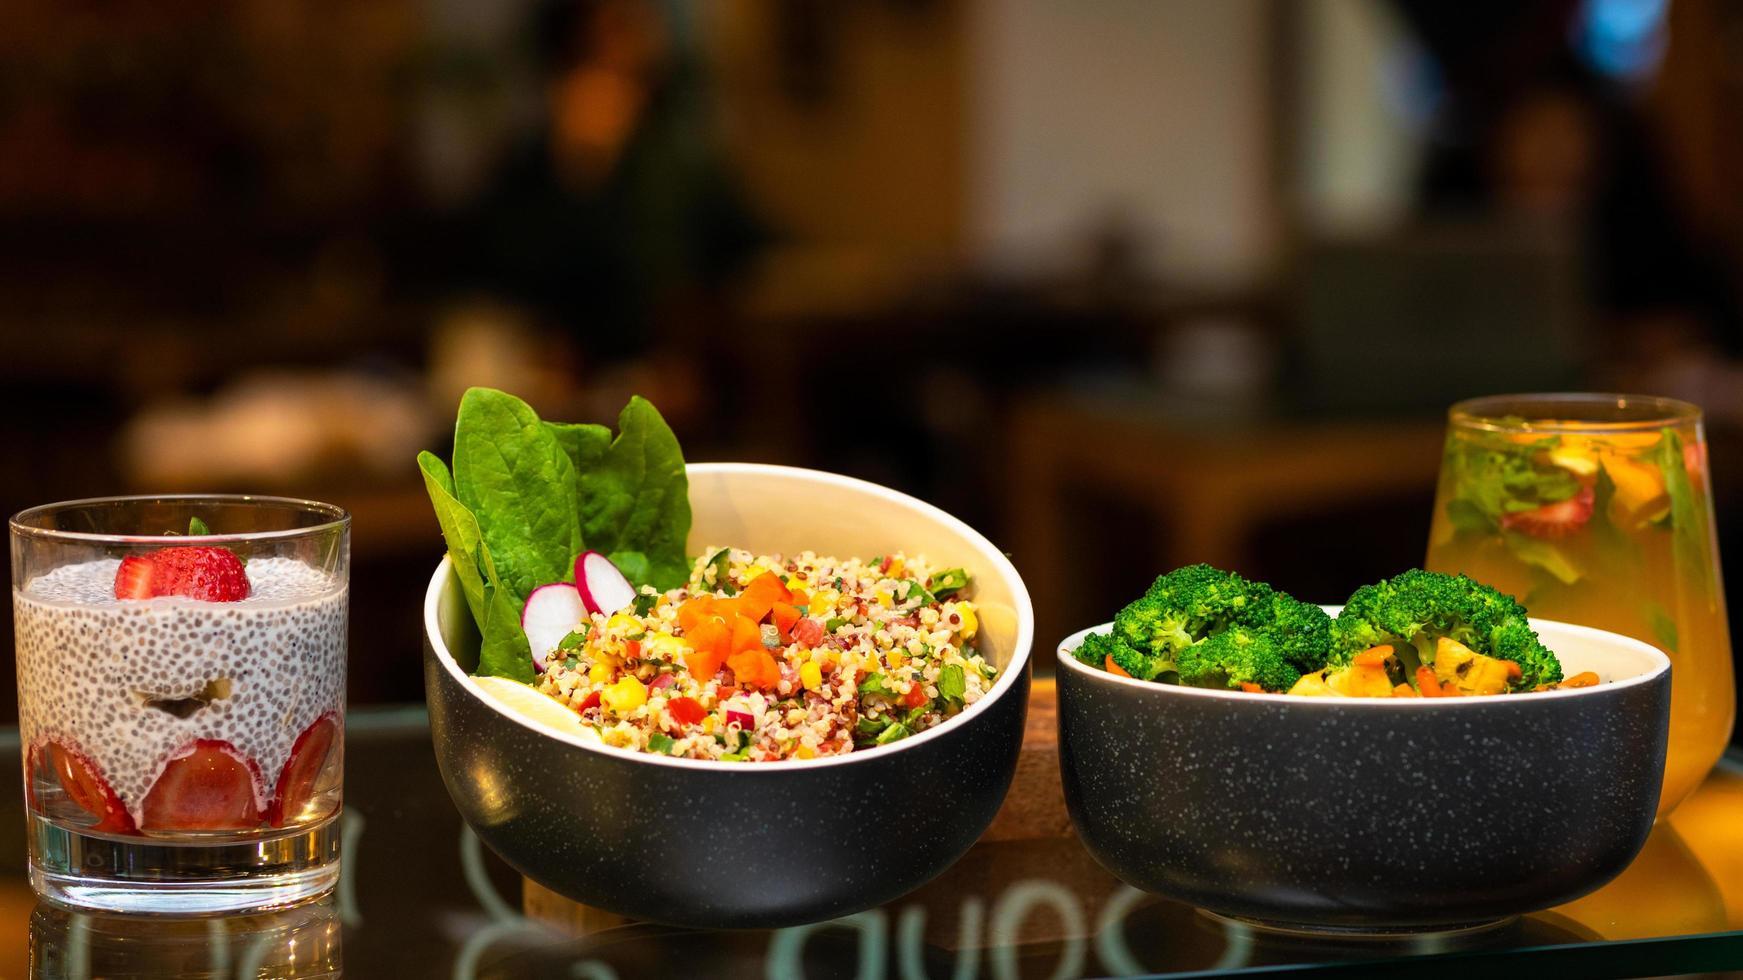 platos de verduras con pudín de chía foto